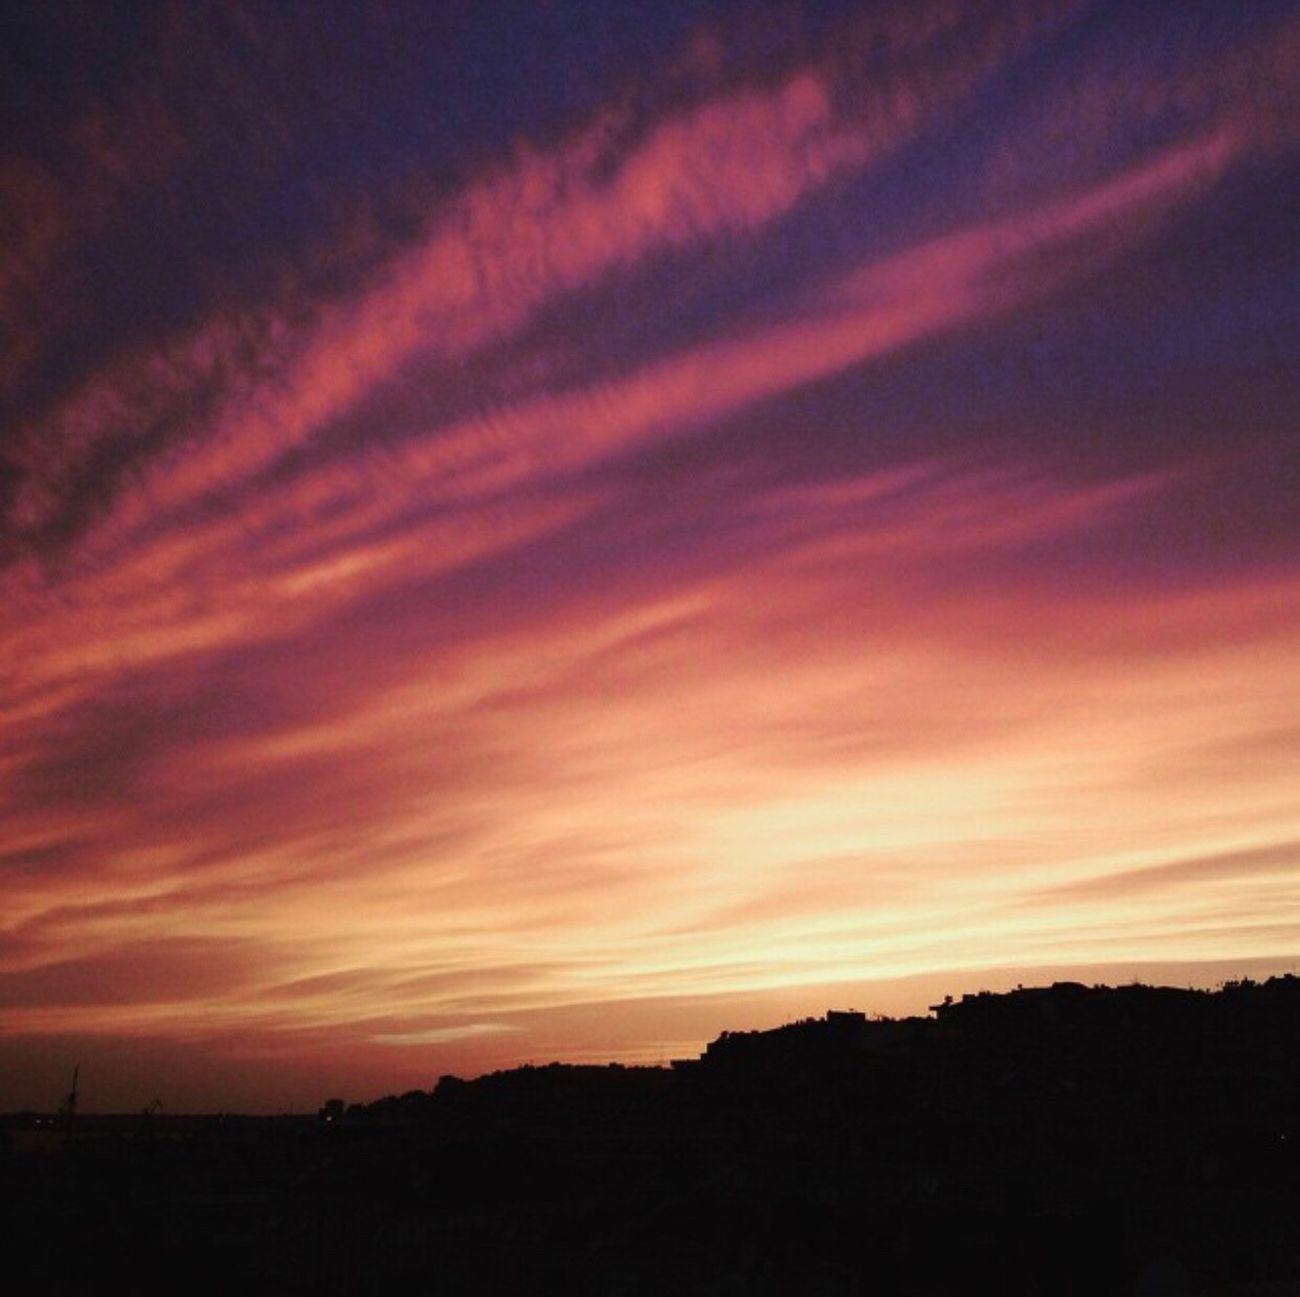 Turkey Bayraklı, İzmir Sunset